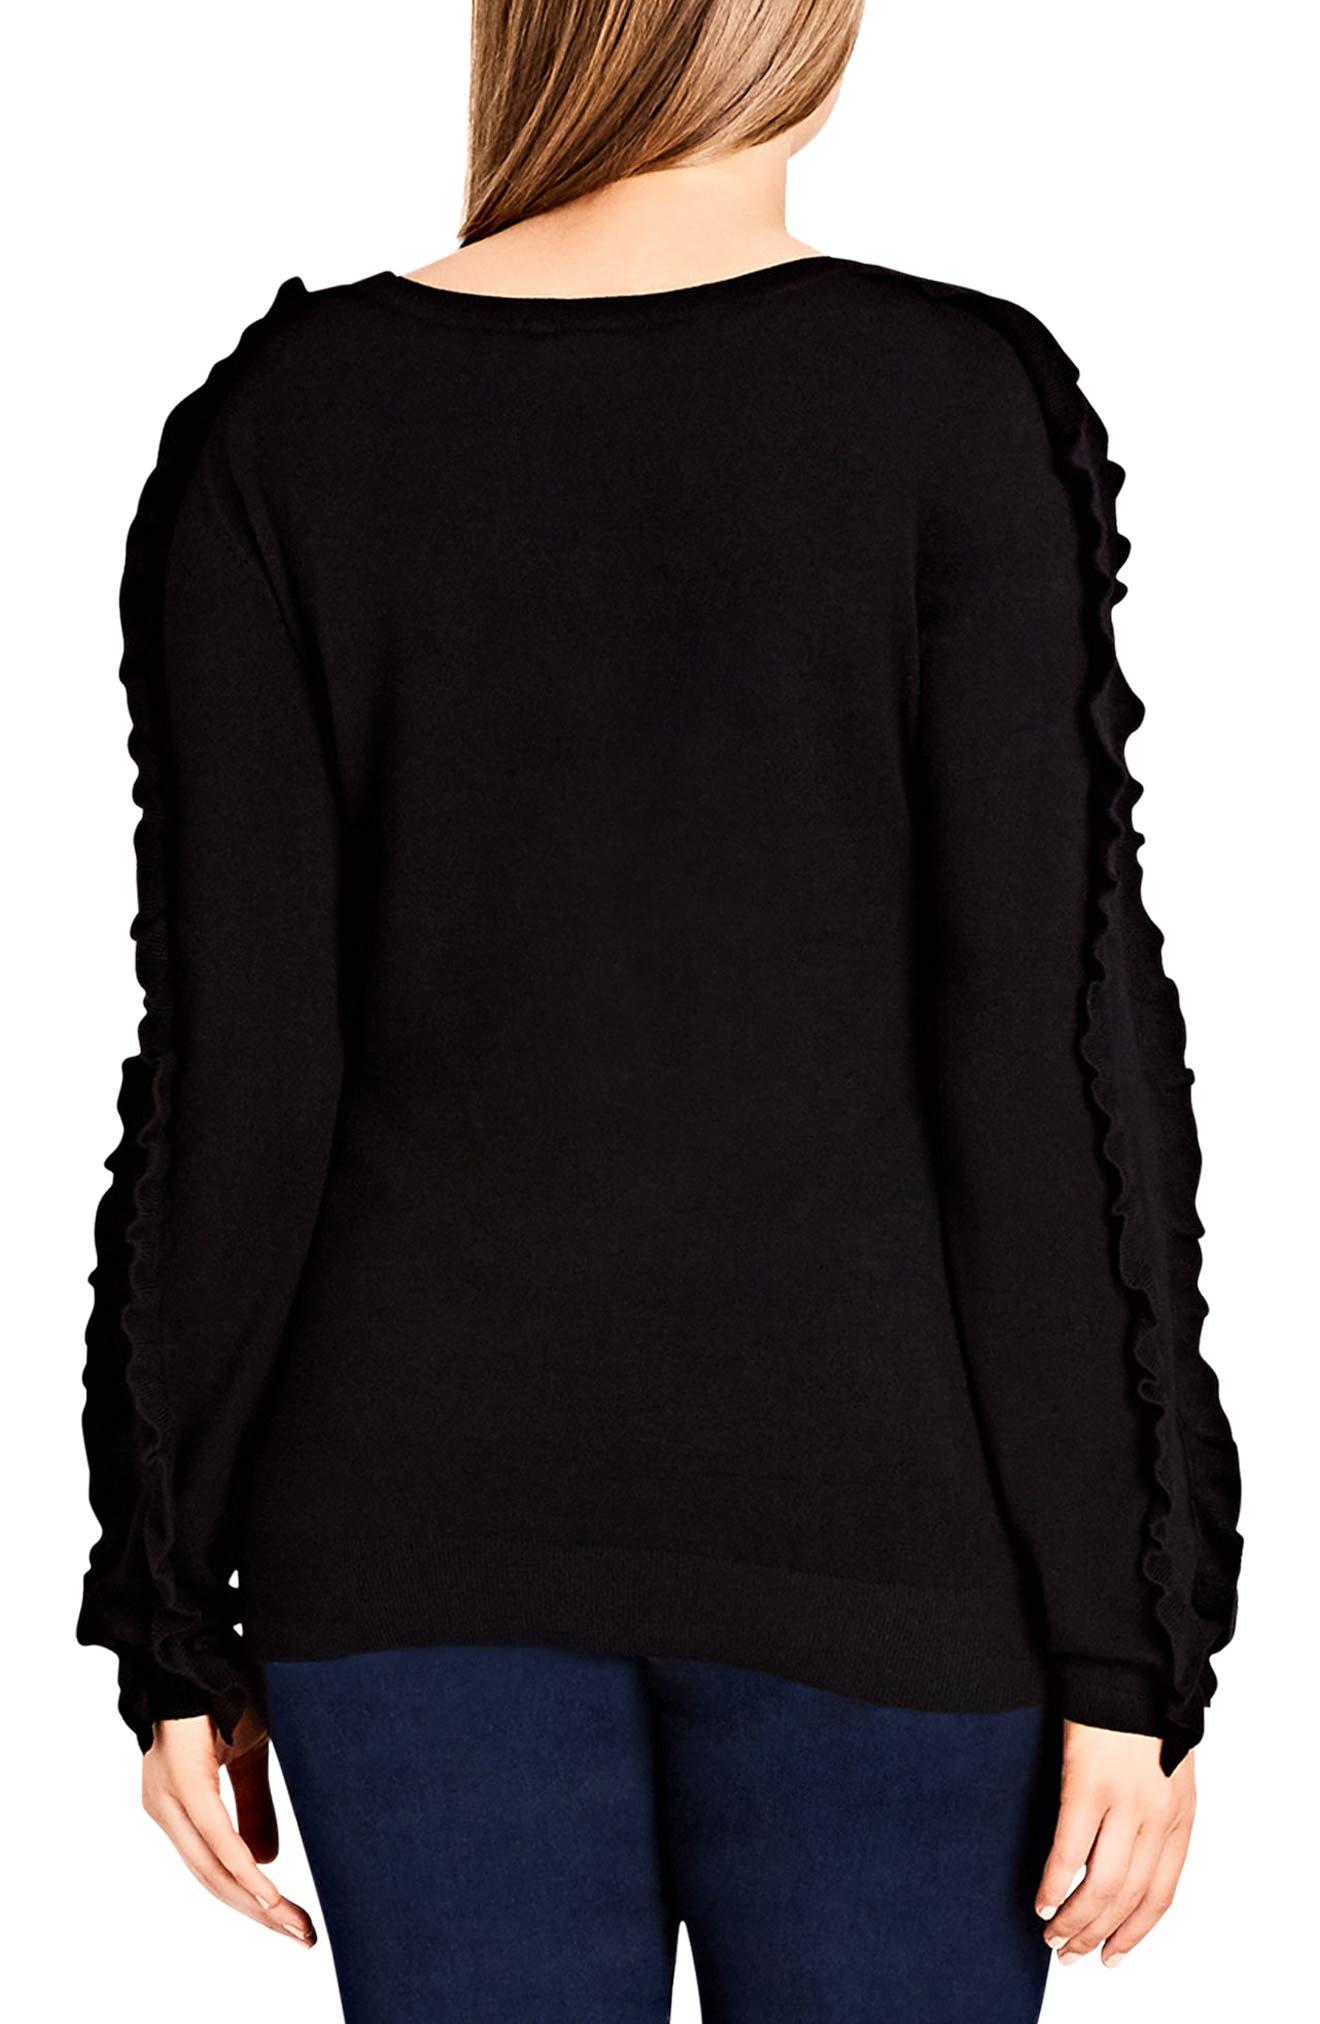 Charmed Ruffle Sleeve Sweater,                             Alternate thumbnail 2, color,                             BLACK